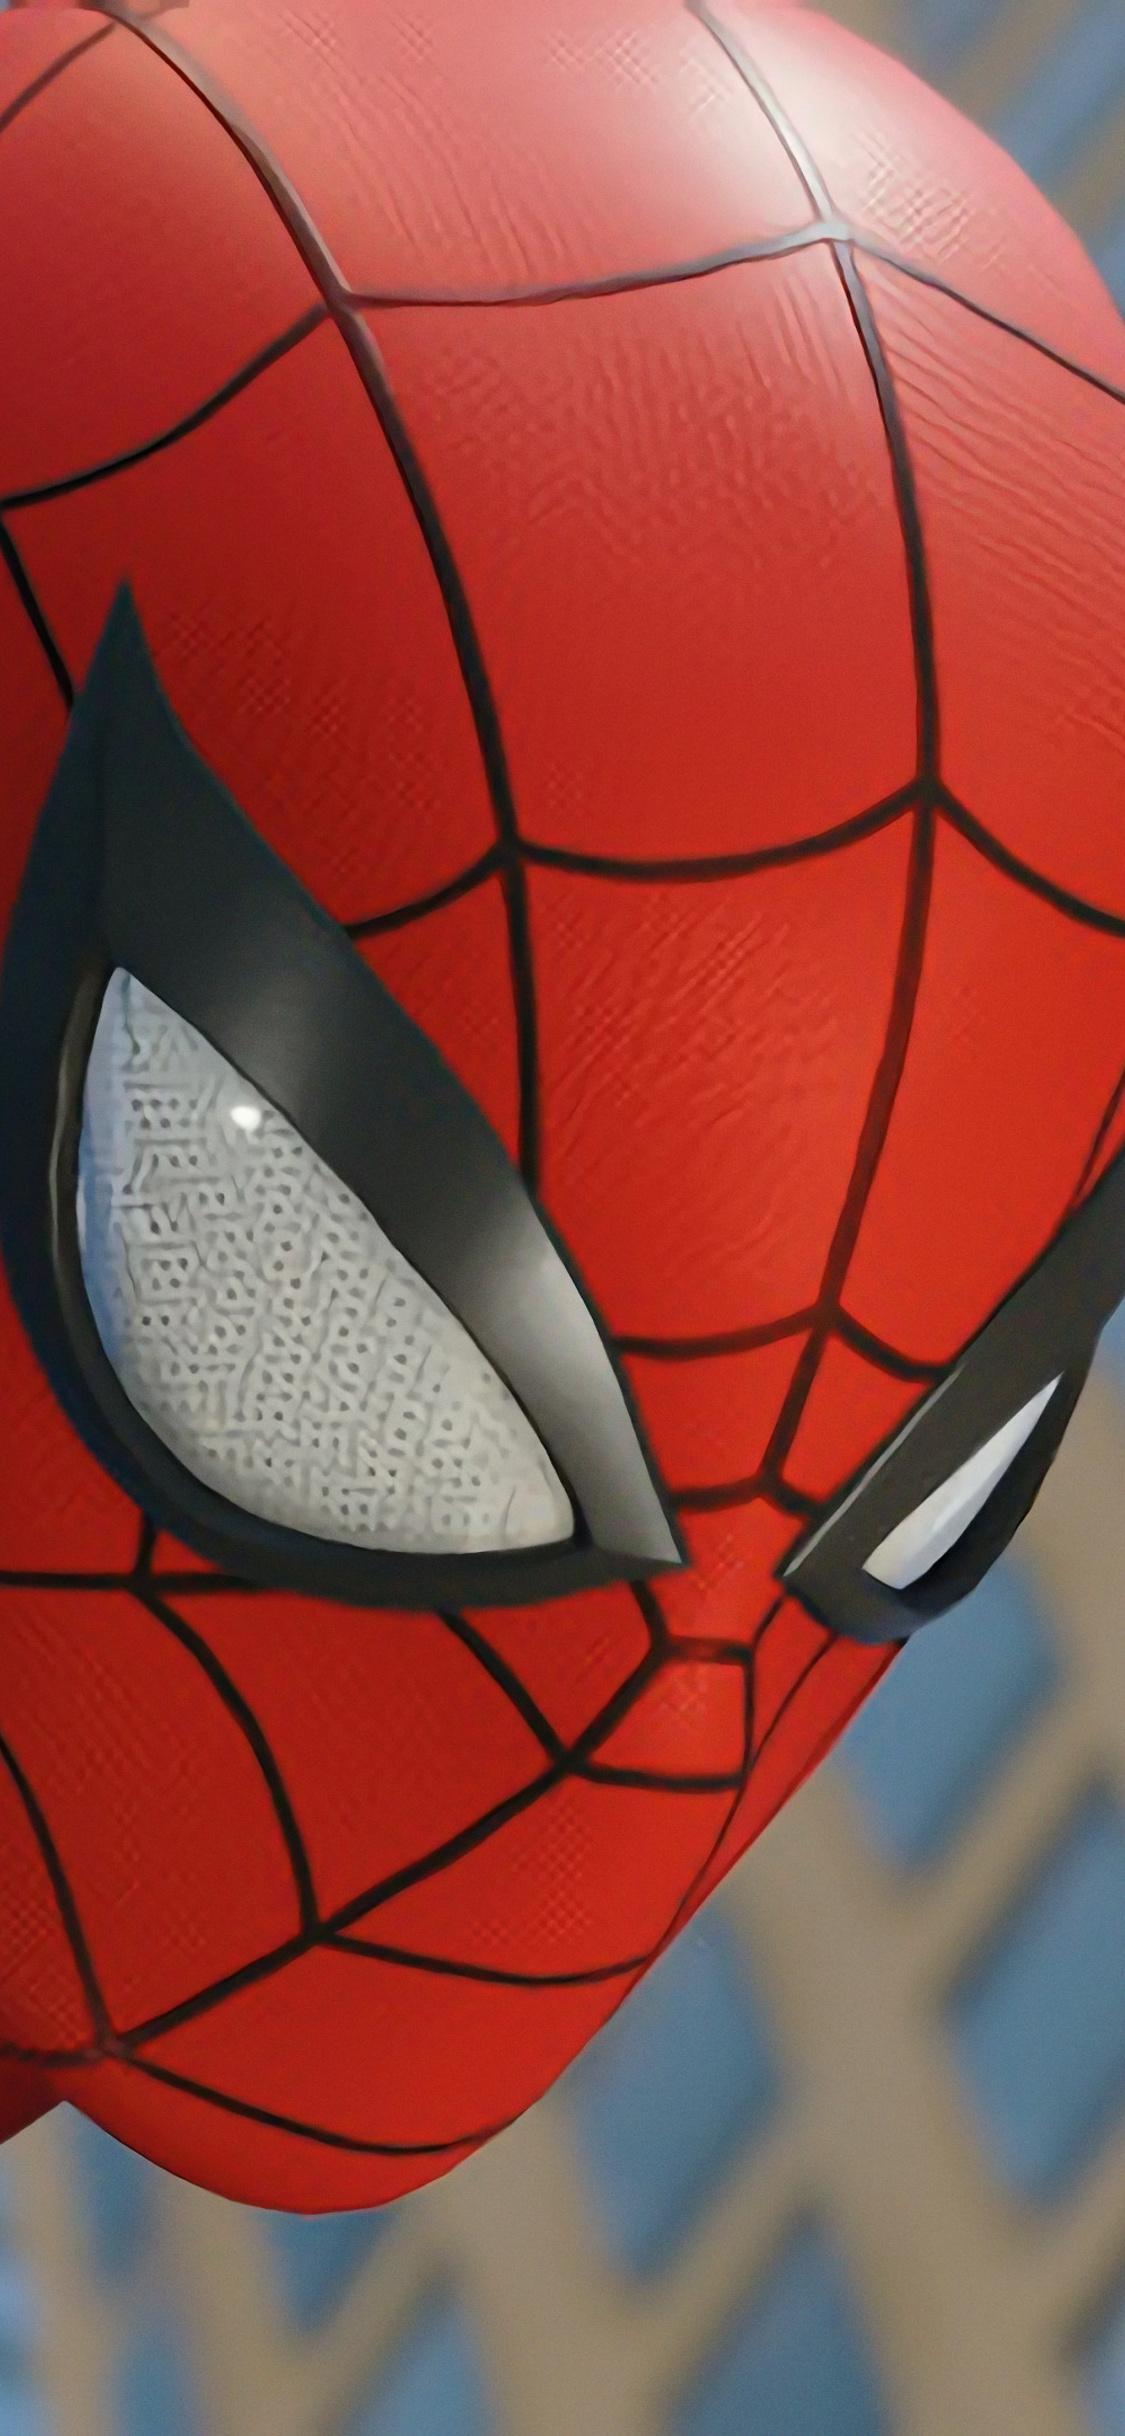 1125x2436 Spiderman 4k Game Iphone Xs Iphone 10 Iphone X Hd 4k